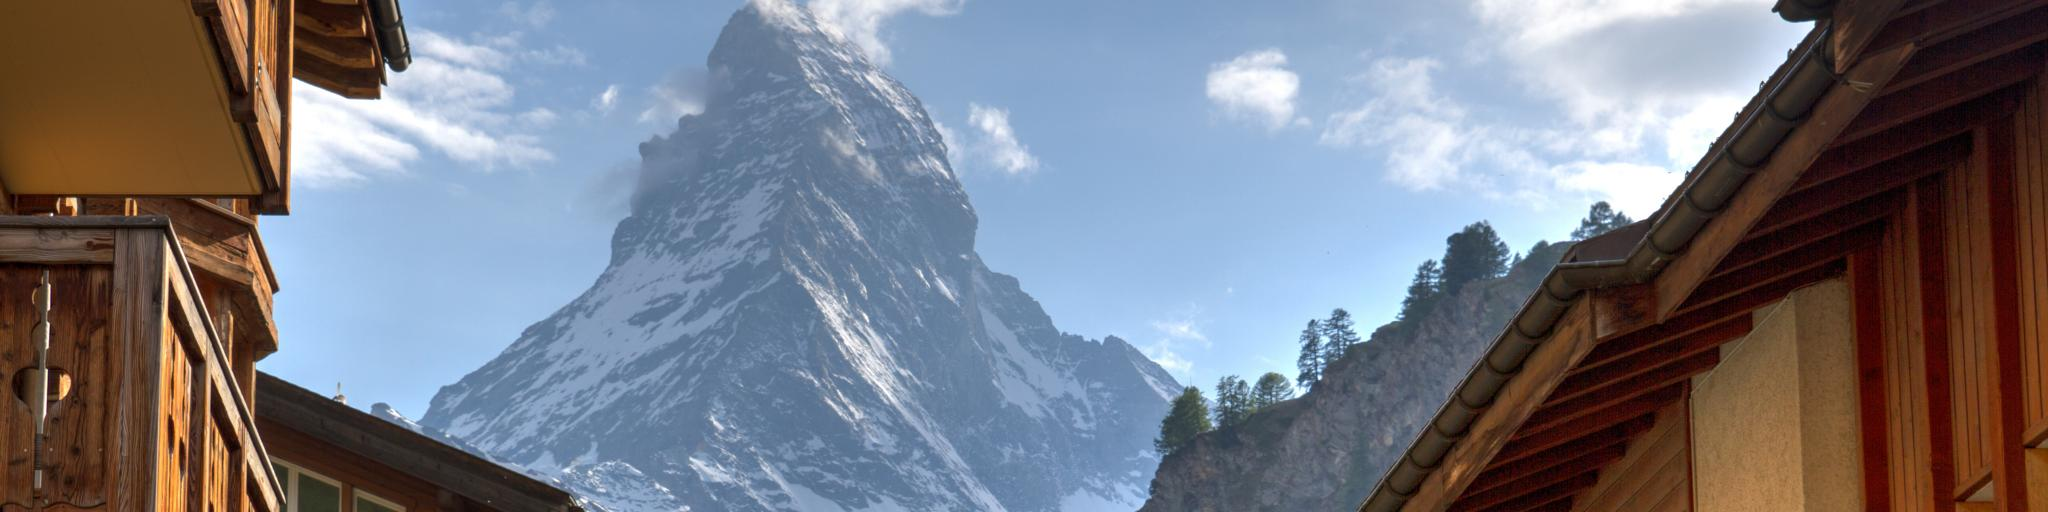 The Matterhorn mountain looms behind the buildings of Zermatt